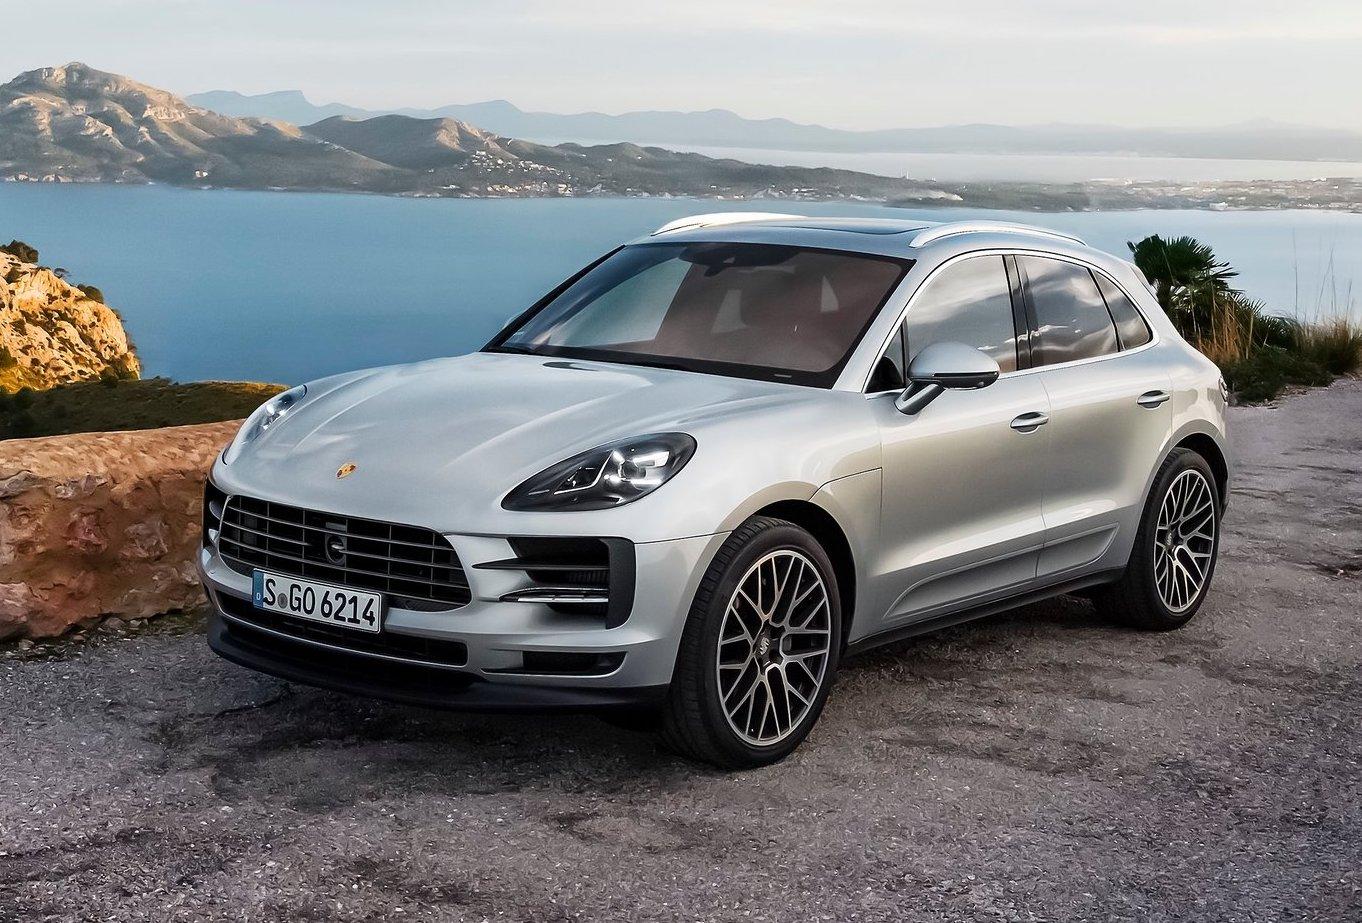 2019 Porsche Macan S arrives, debuts new turbo V6 ...